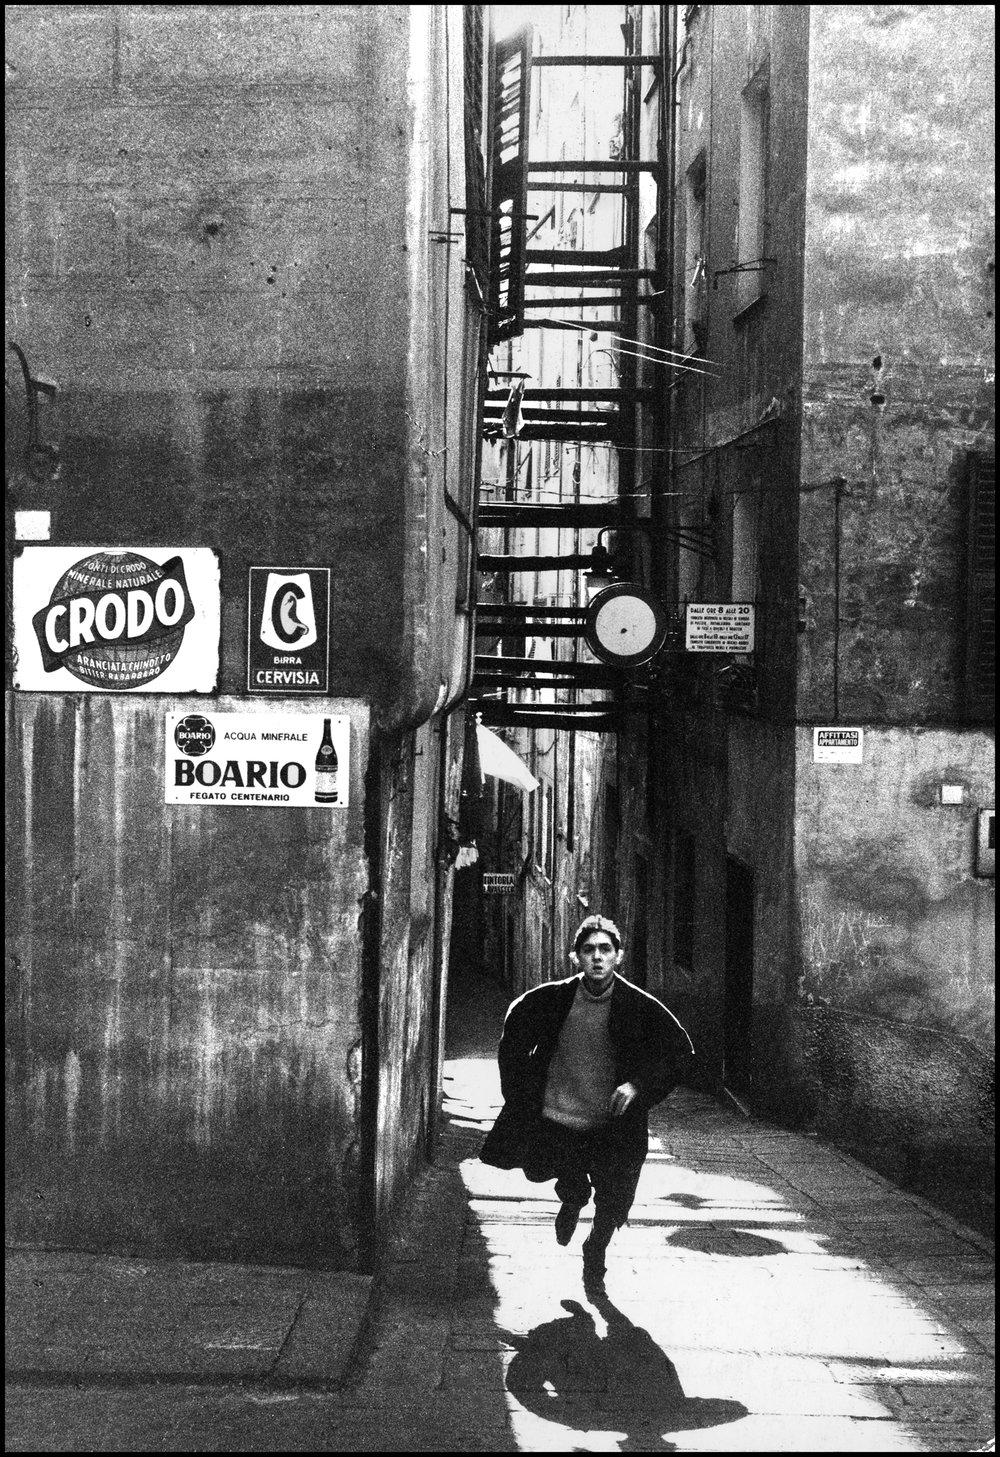 Genoa. Courtesy of © Hope Herman Wurmfeld